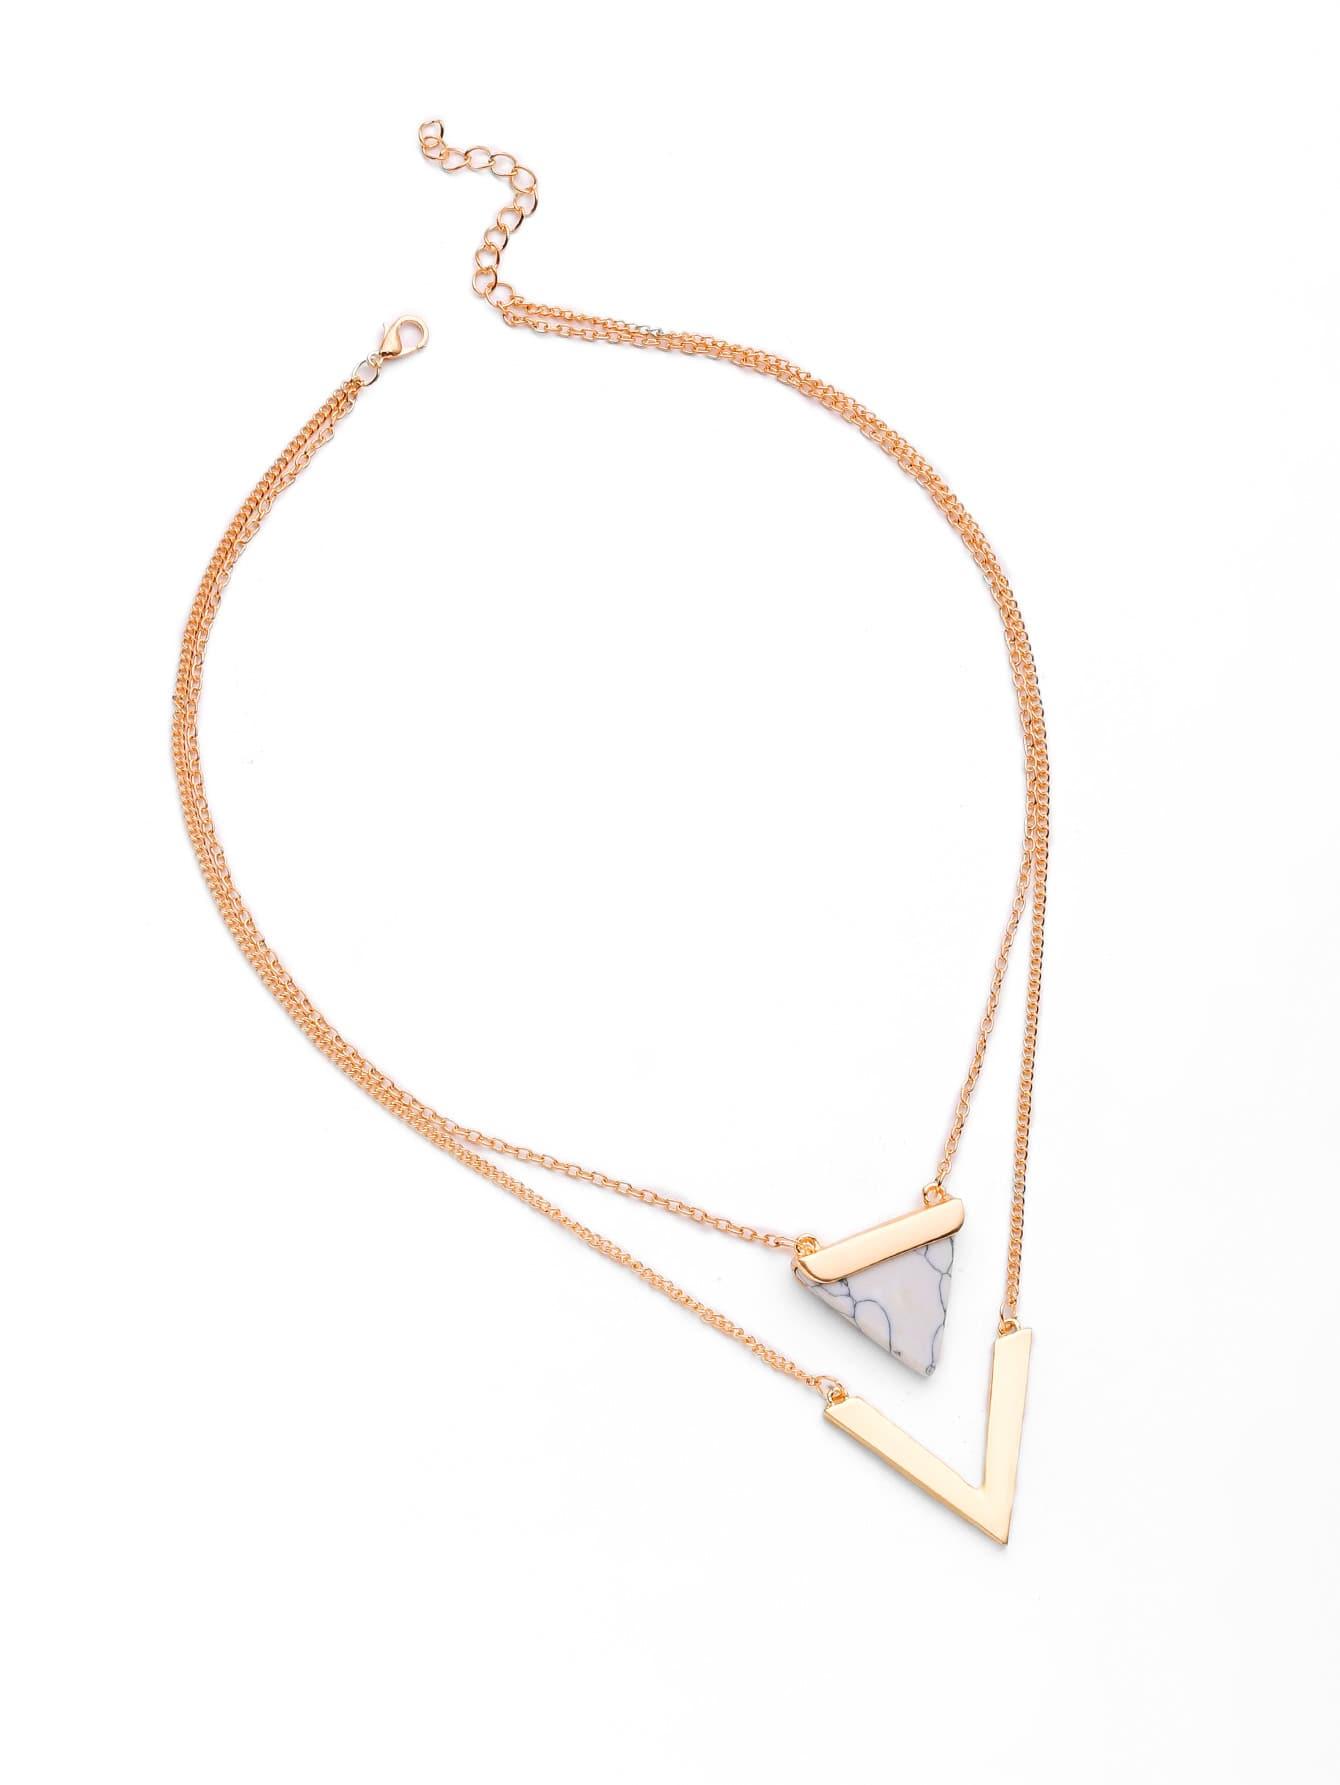 Фото Metal V Shaped And Triangle Design Layered Necklace. Купить с доставкой